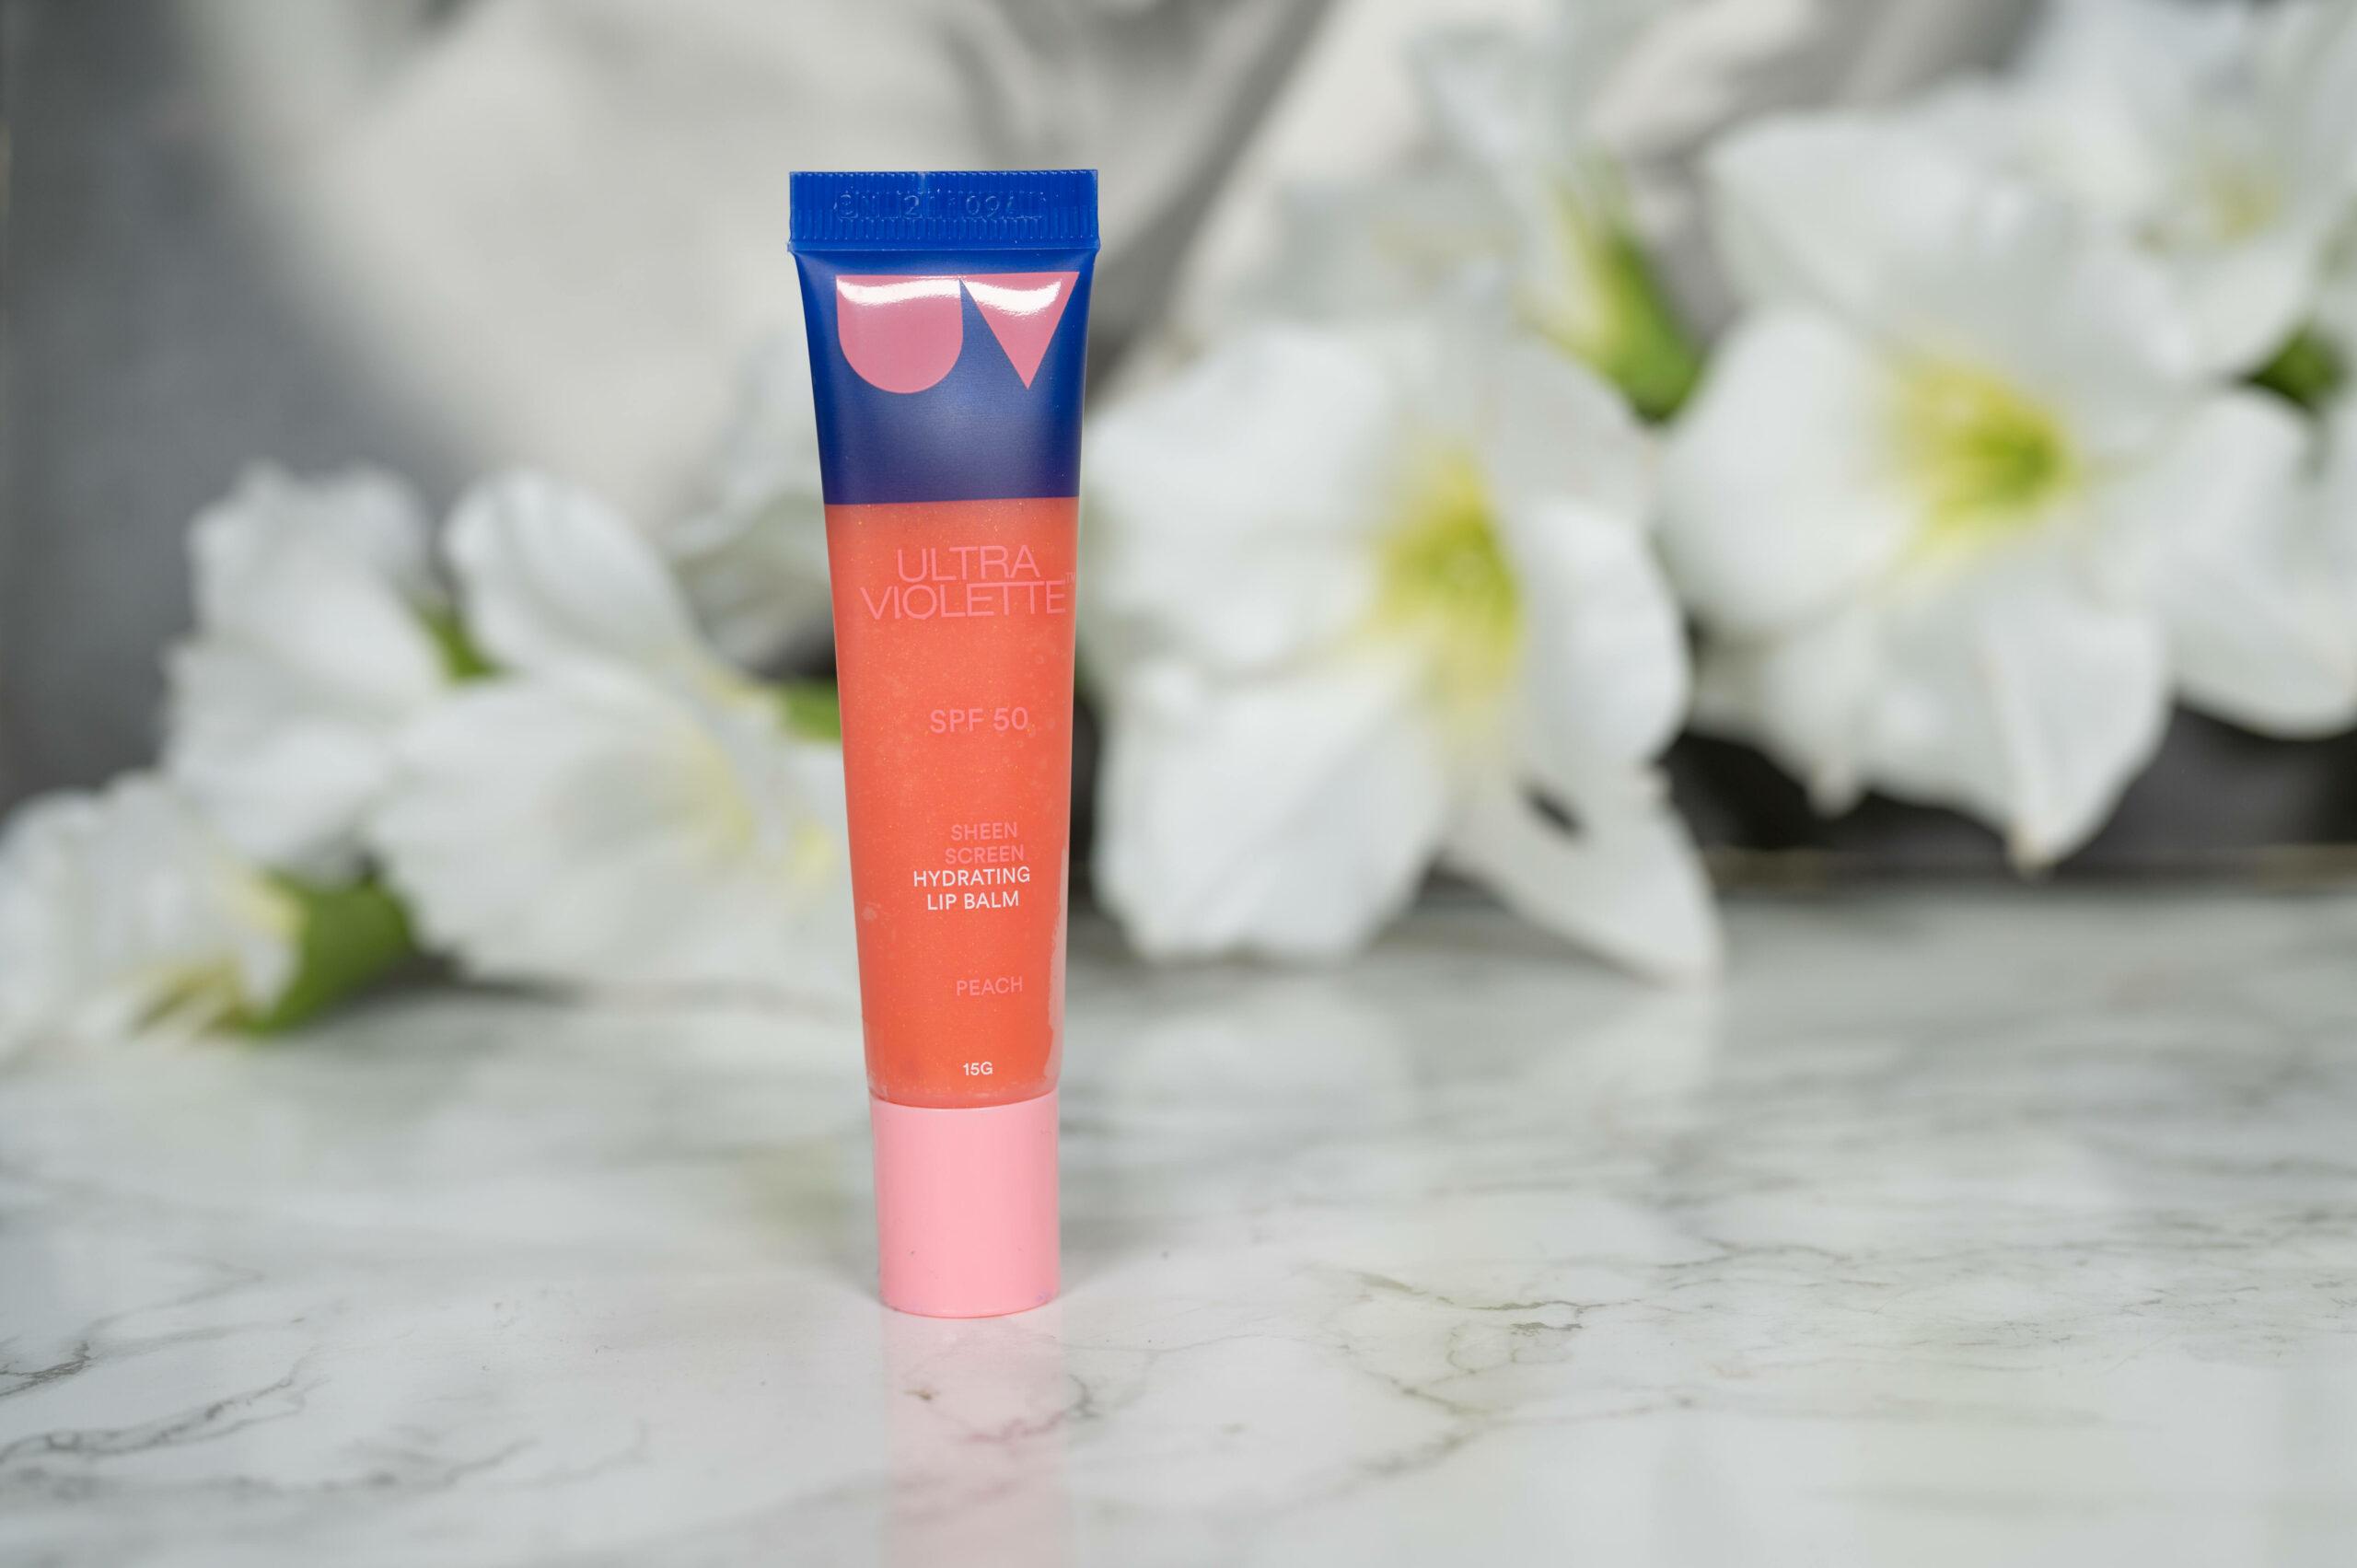 Ultra Violette Sheen Screen Hydrating Lip Balm SPF 50